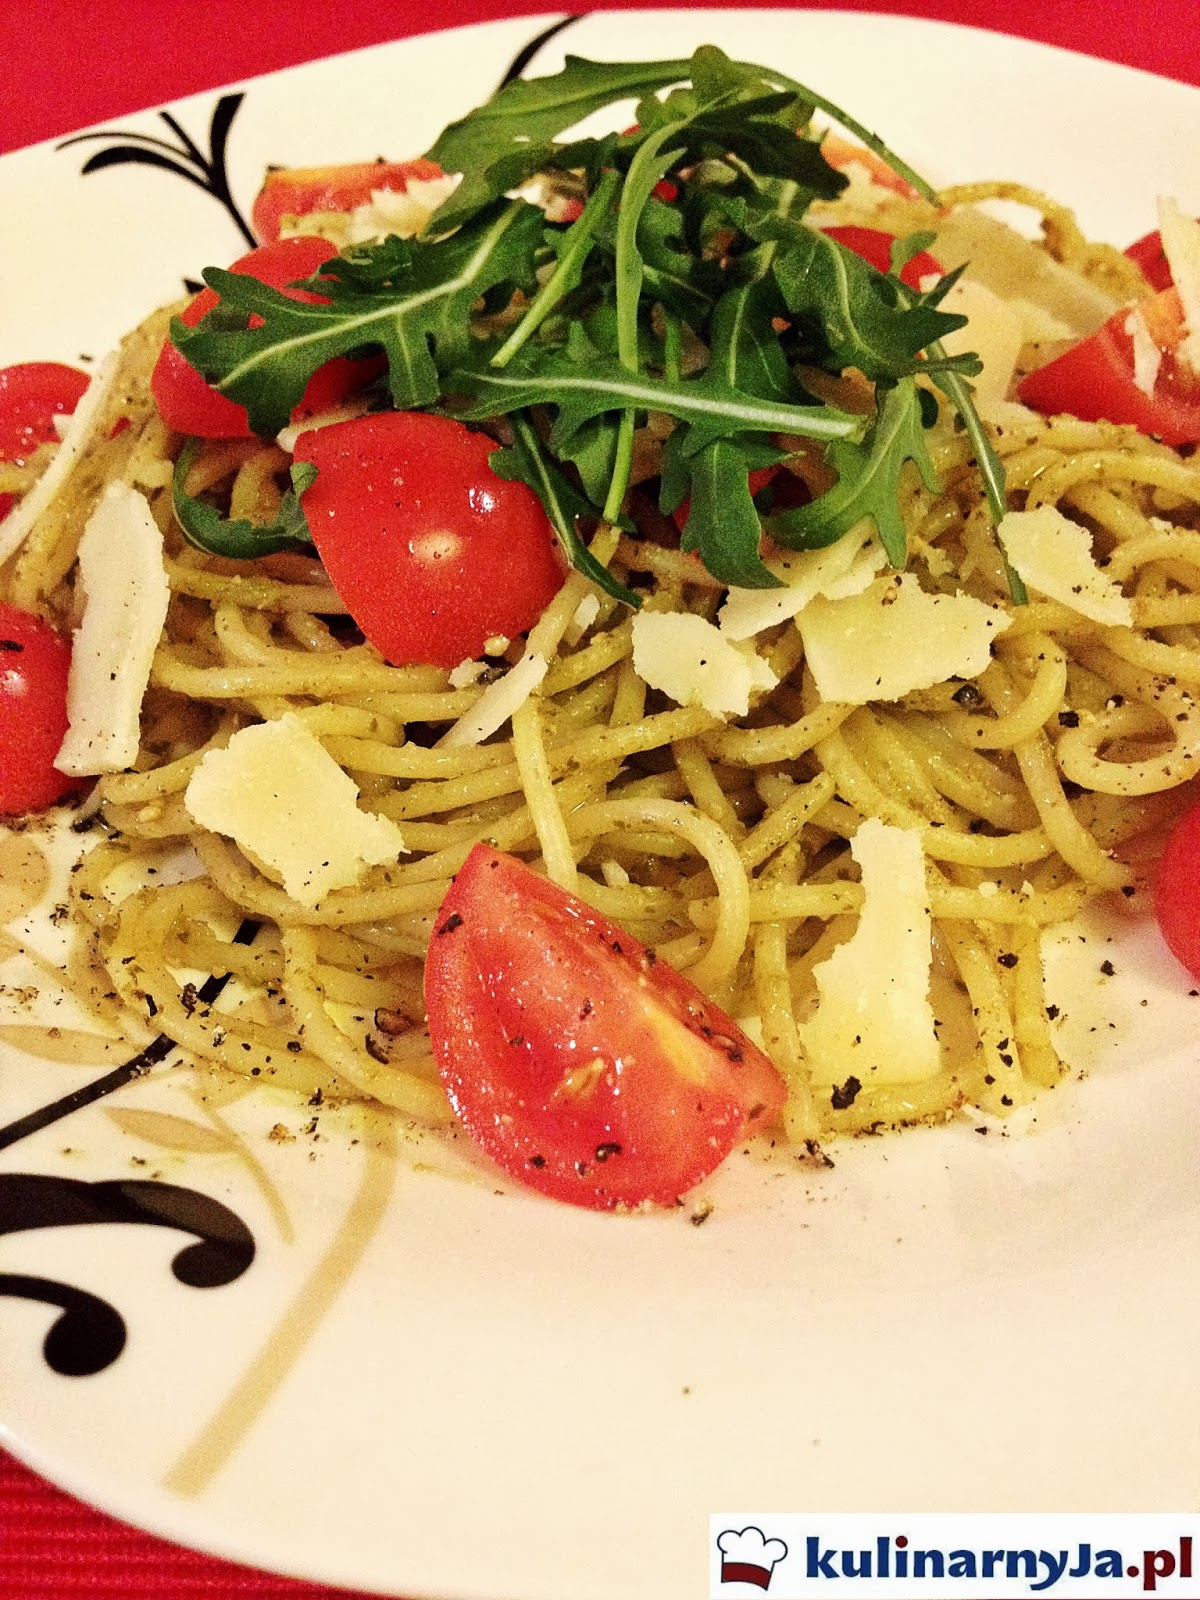 Spaghetti pesto z pomidorami i grana padano